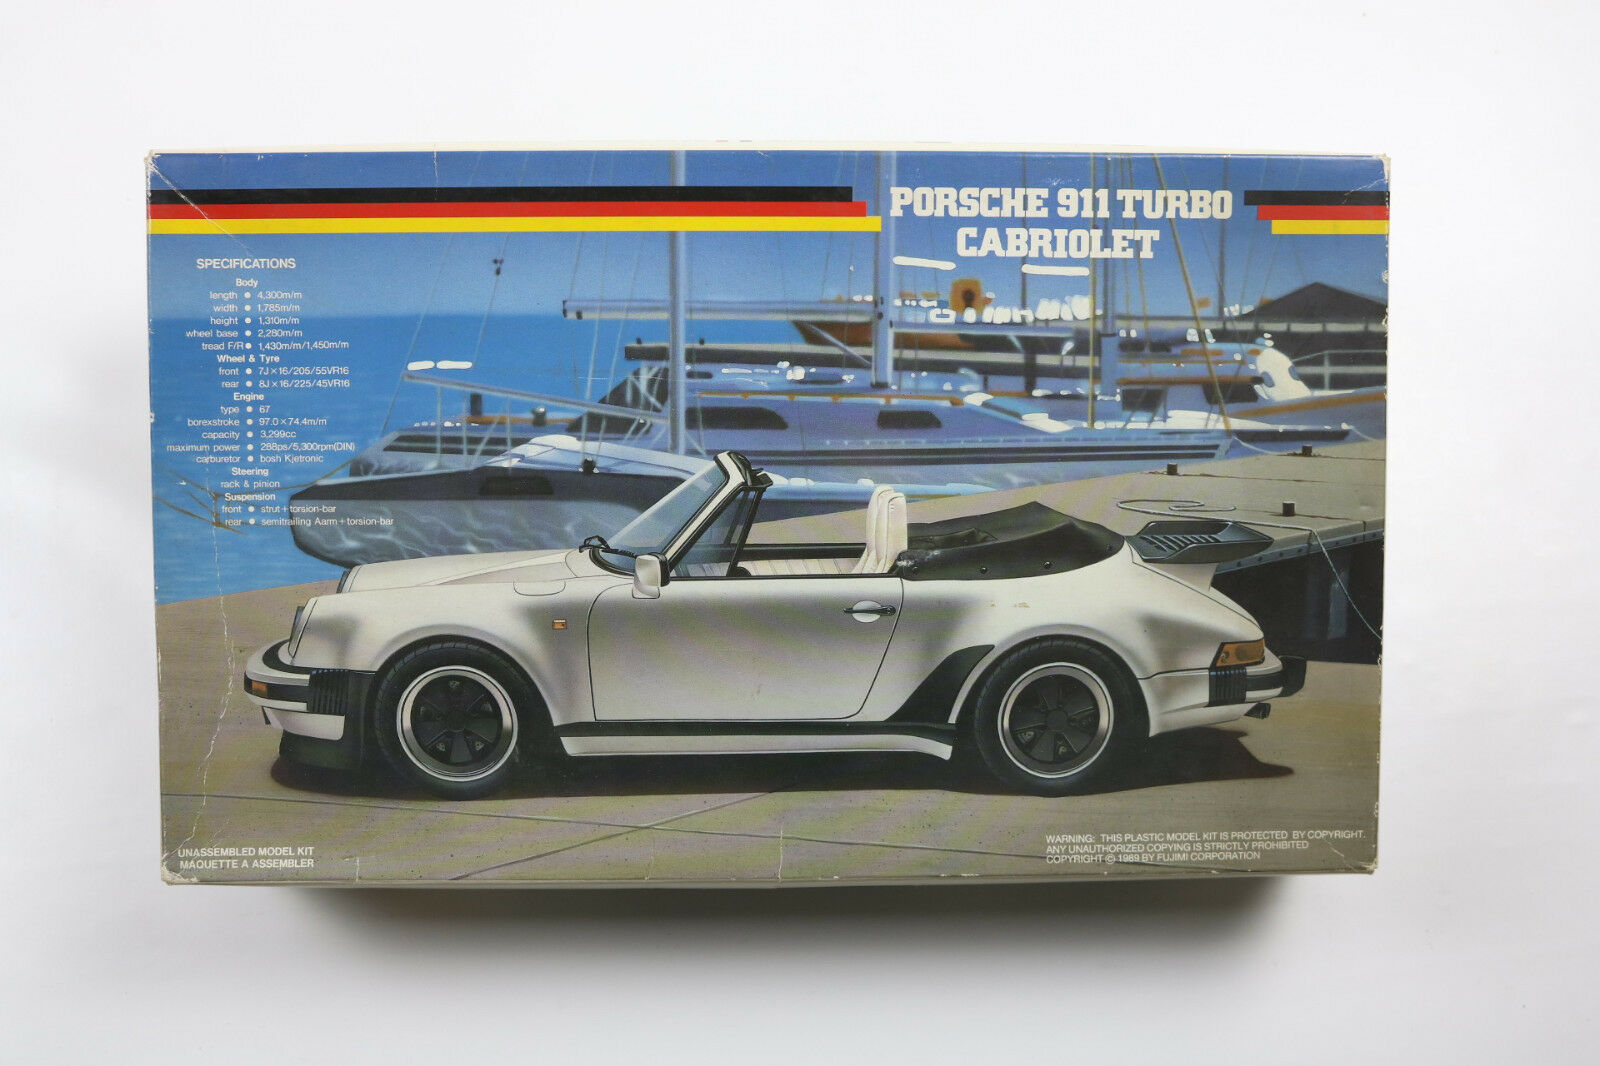 VINTAGE FUJIMI PORSCHE 911 TURBO CABRIOLET 1989 1 24 AUTO CAR PLASTIC KIT JAPAN